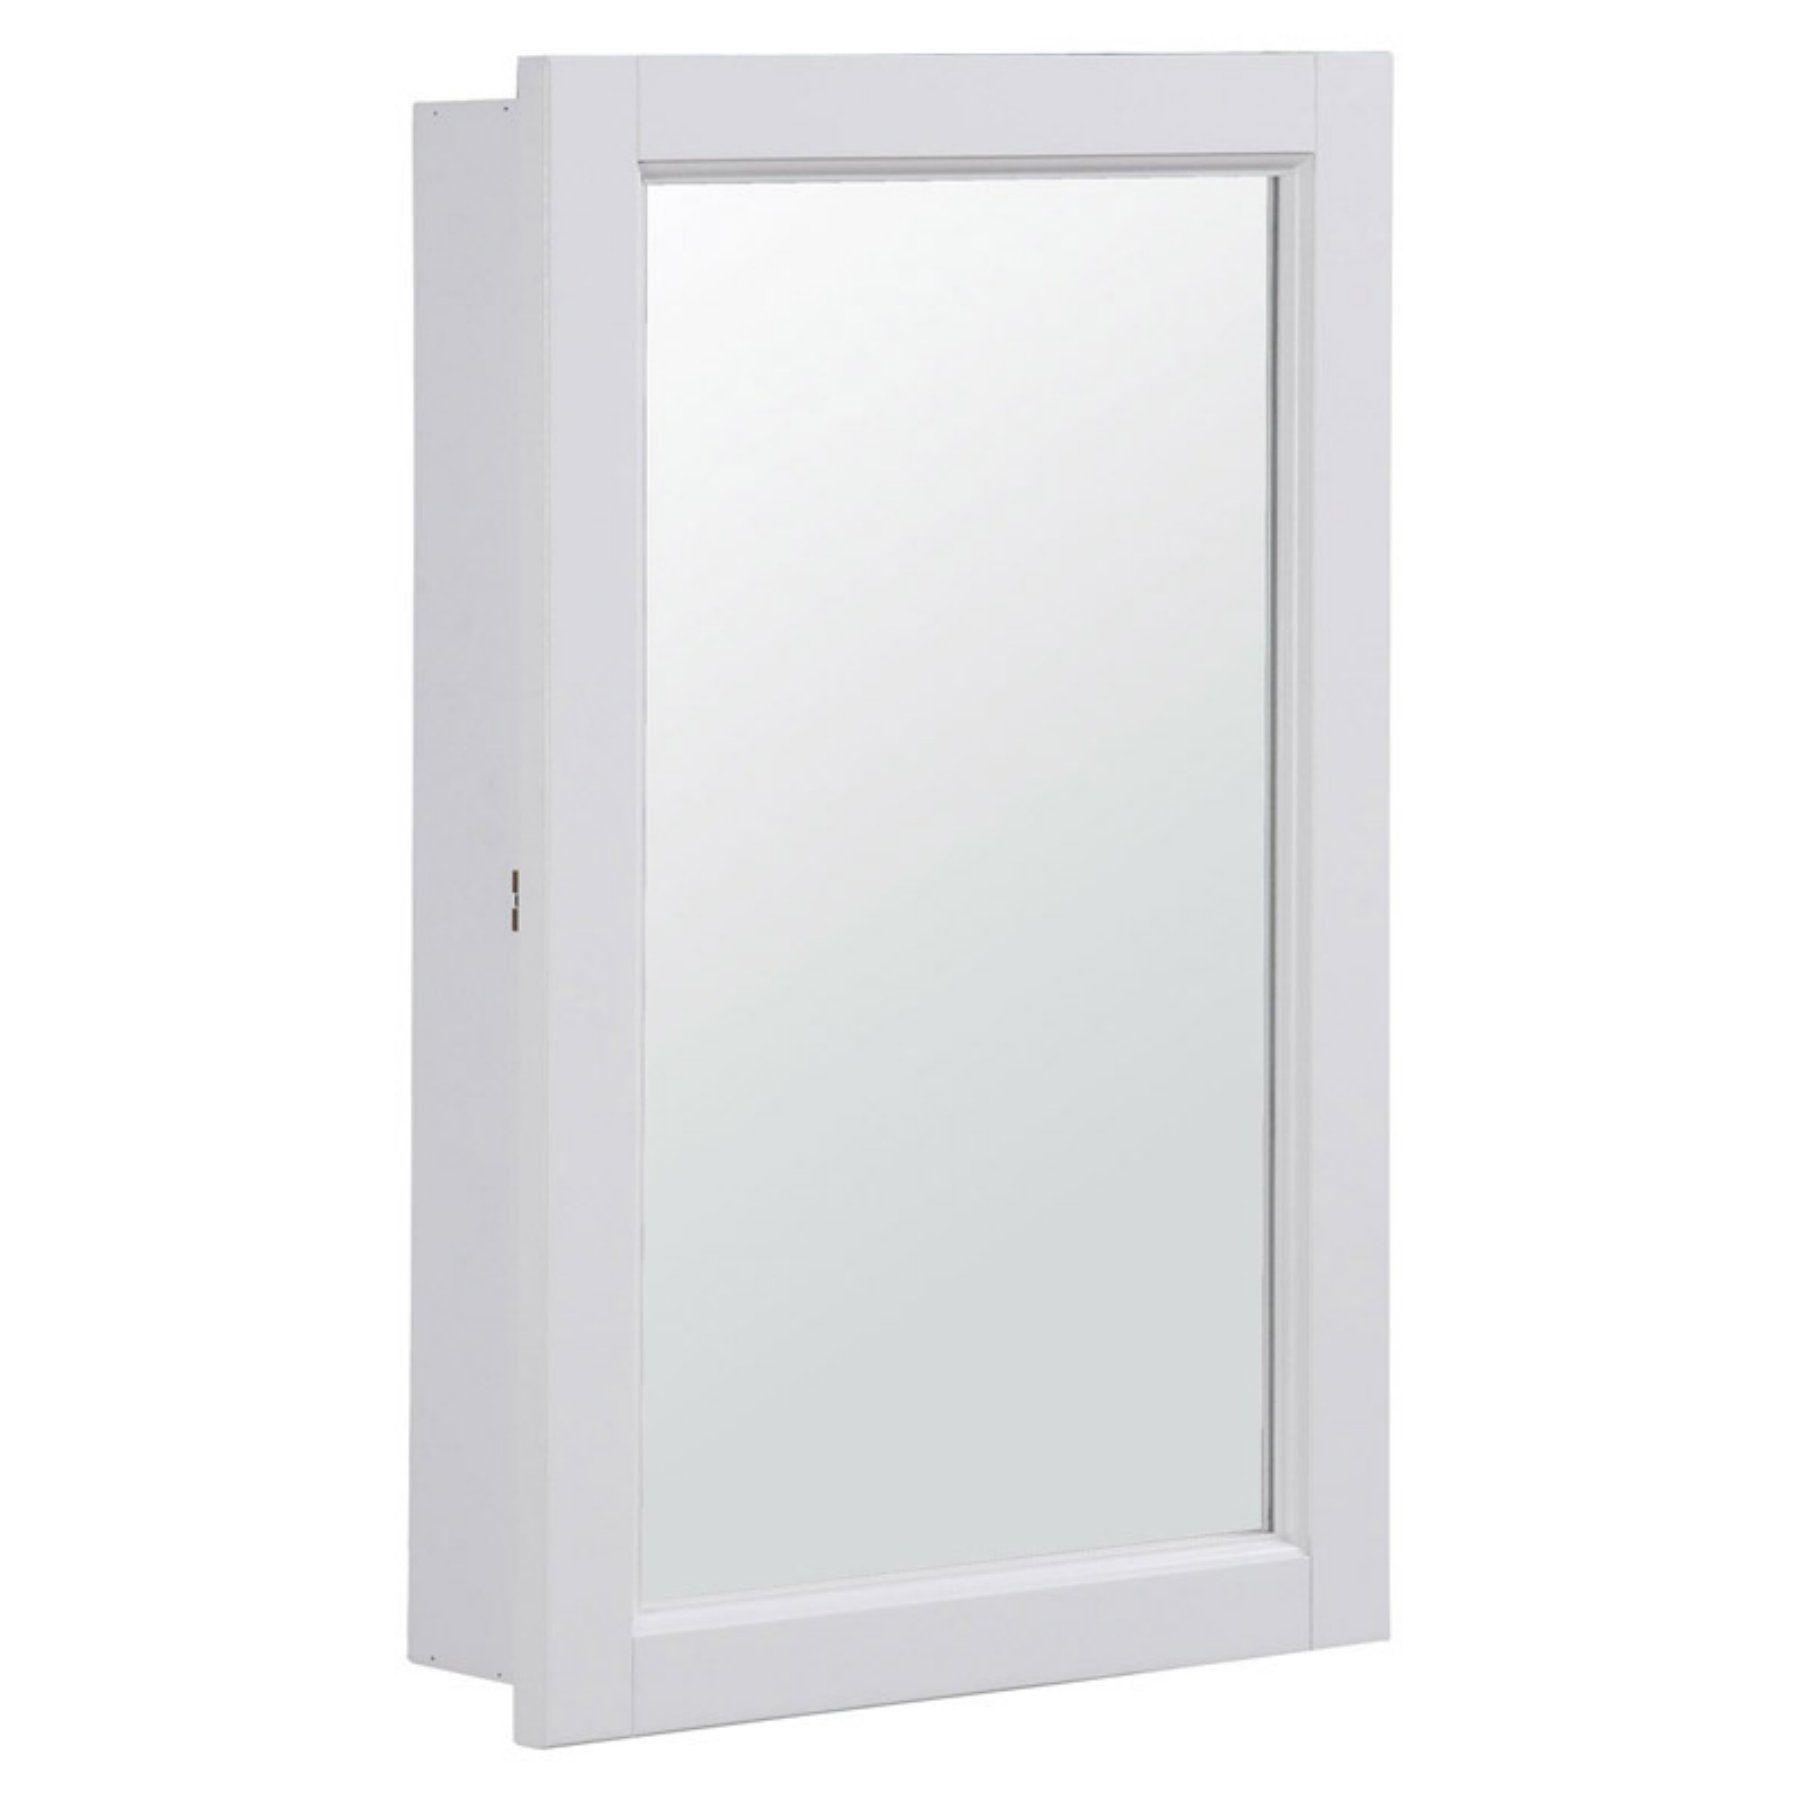 Design house concord medicine cabinet mirror with door and